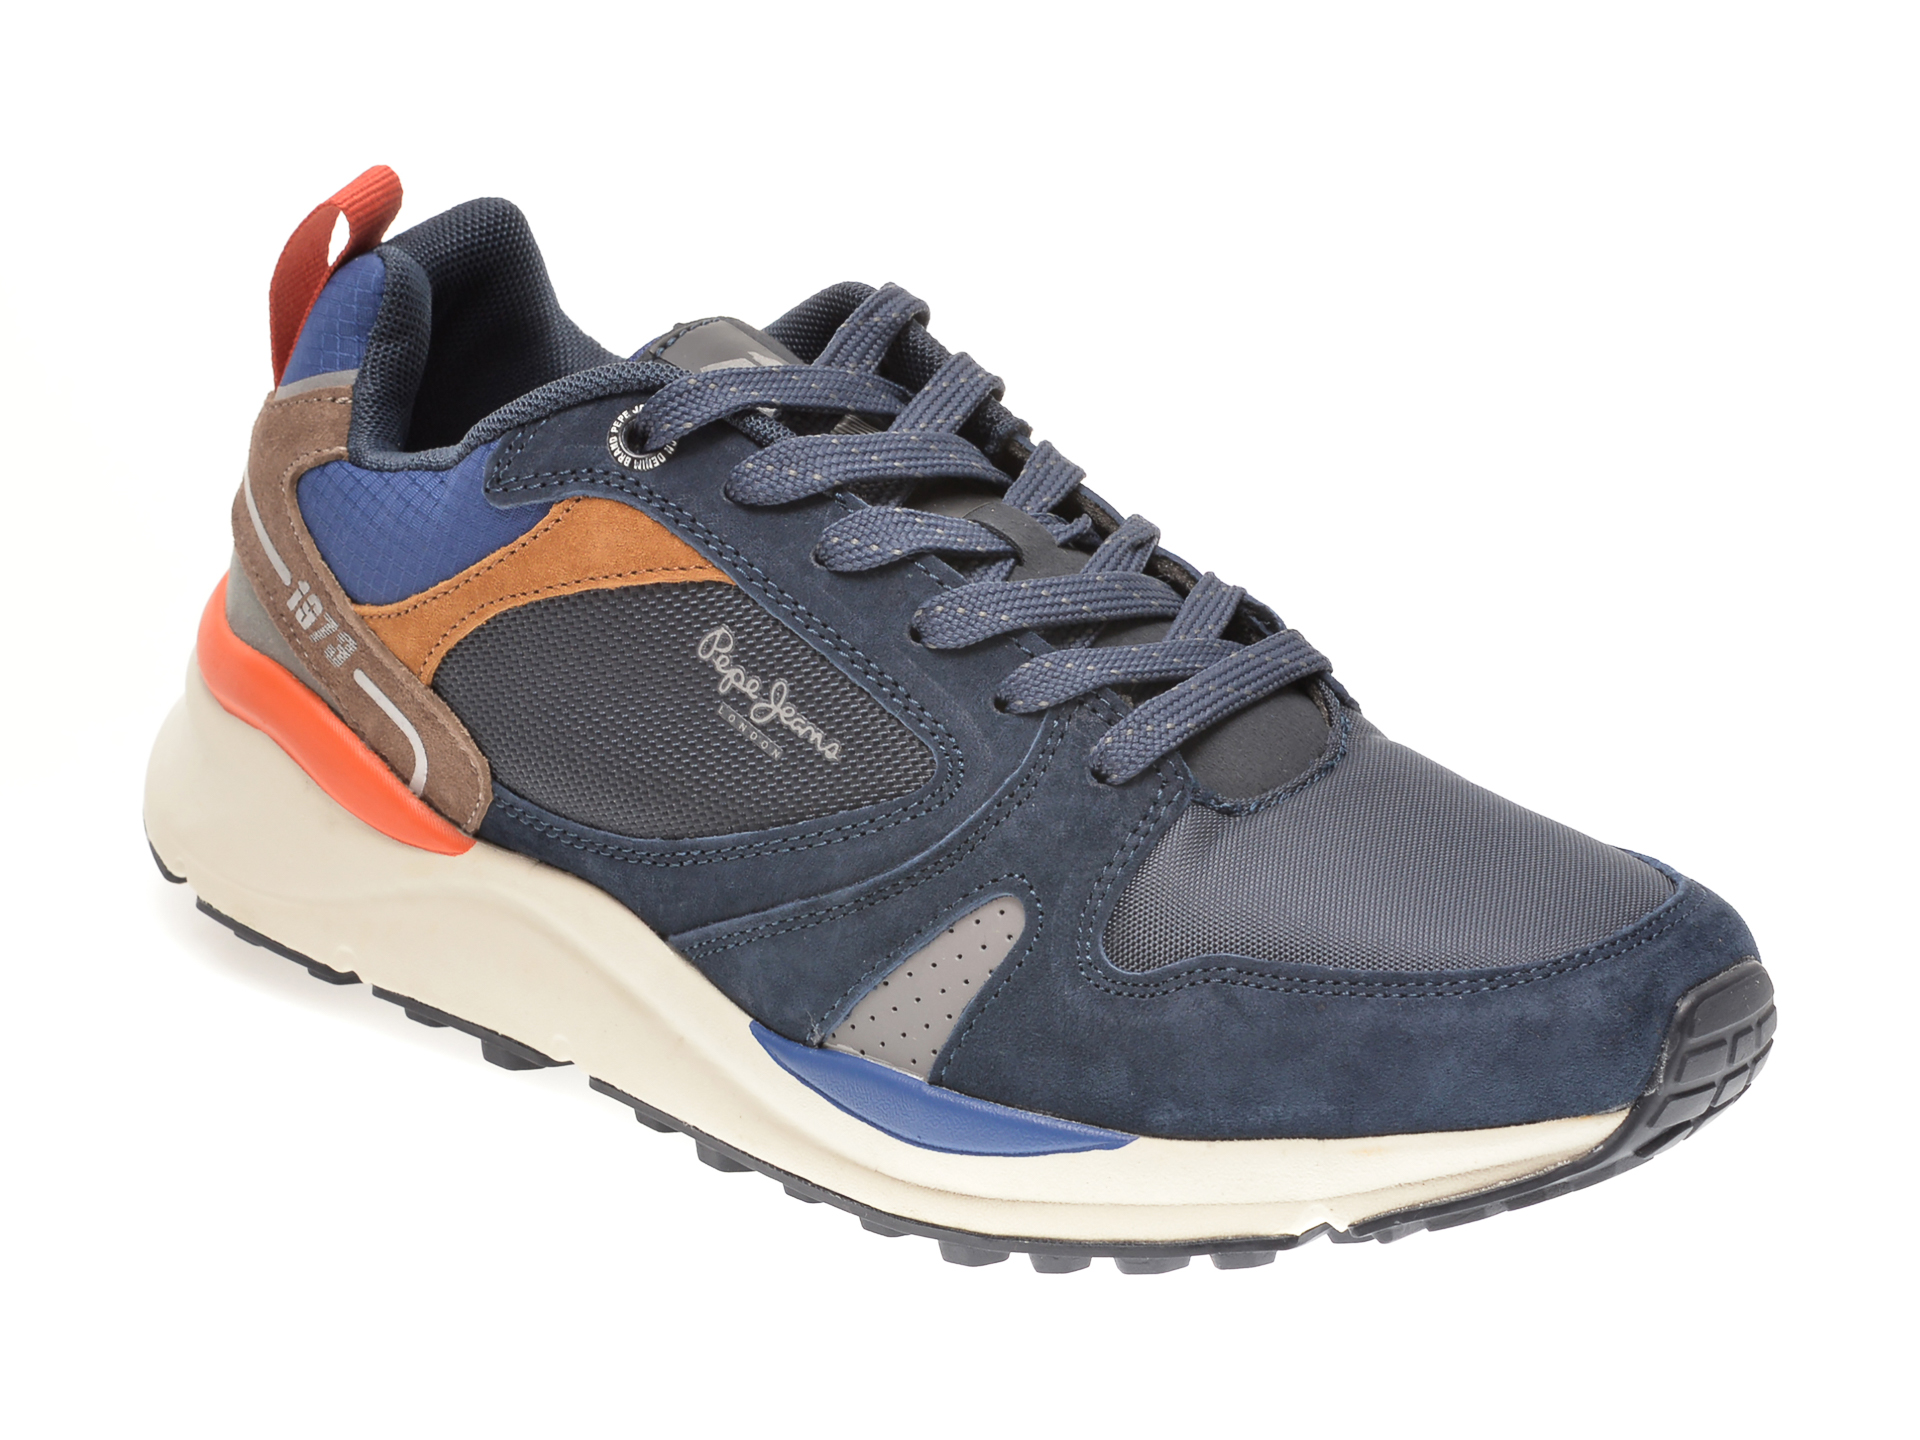 Pantofi sport PEPE JEANS bleumarin, MS30679, din material textil si piele intoarsa